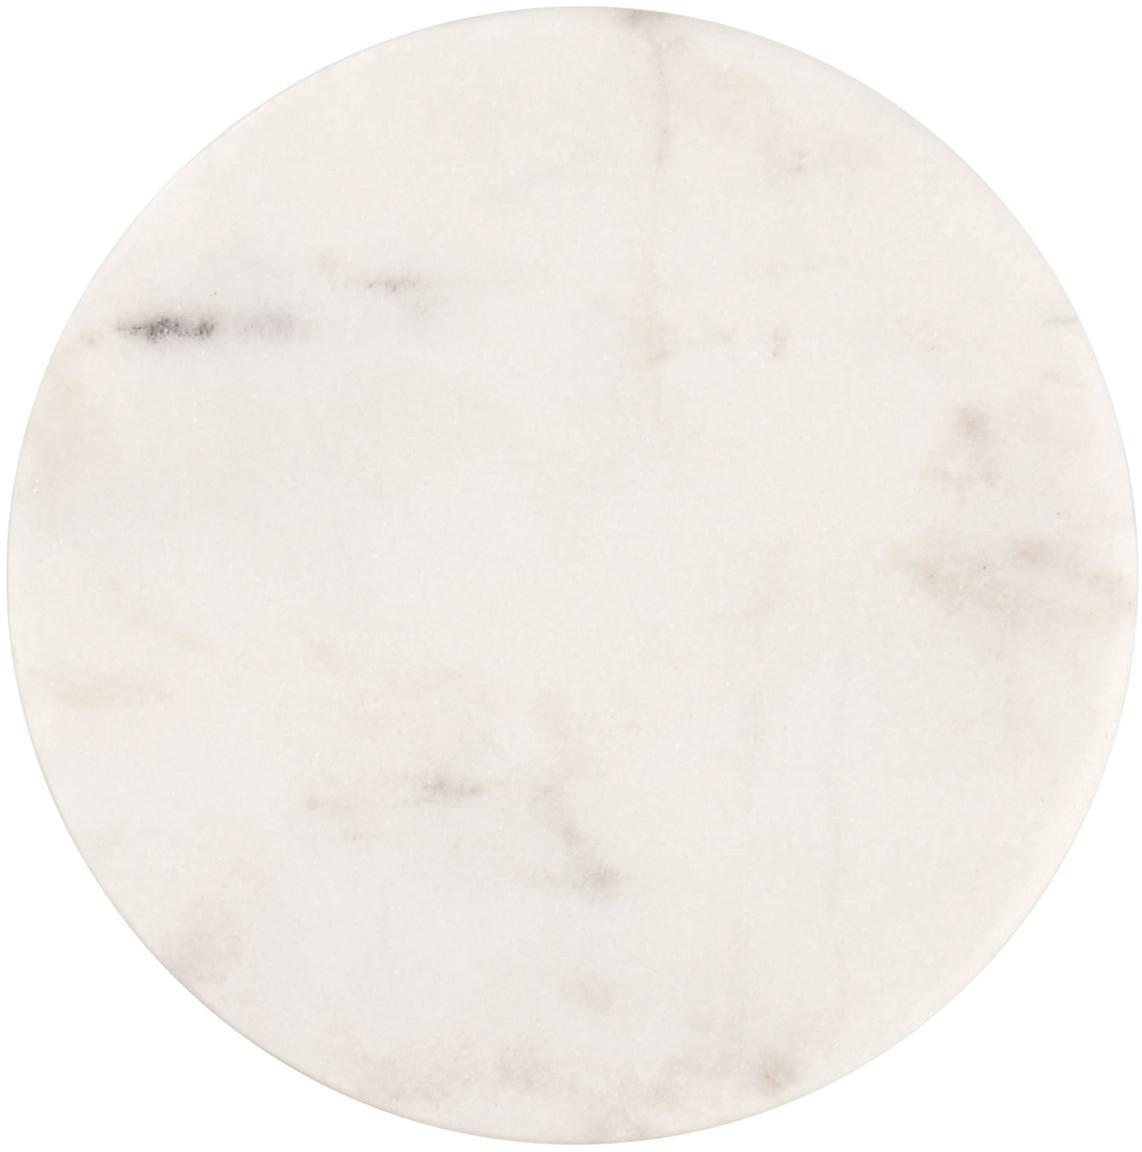 Marmor-Untersetzer Guda, 4 Stück, Marmor, Weiß, Ø 10 cm